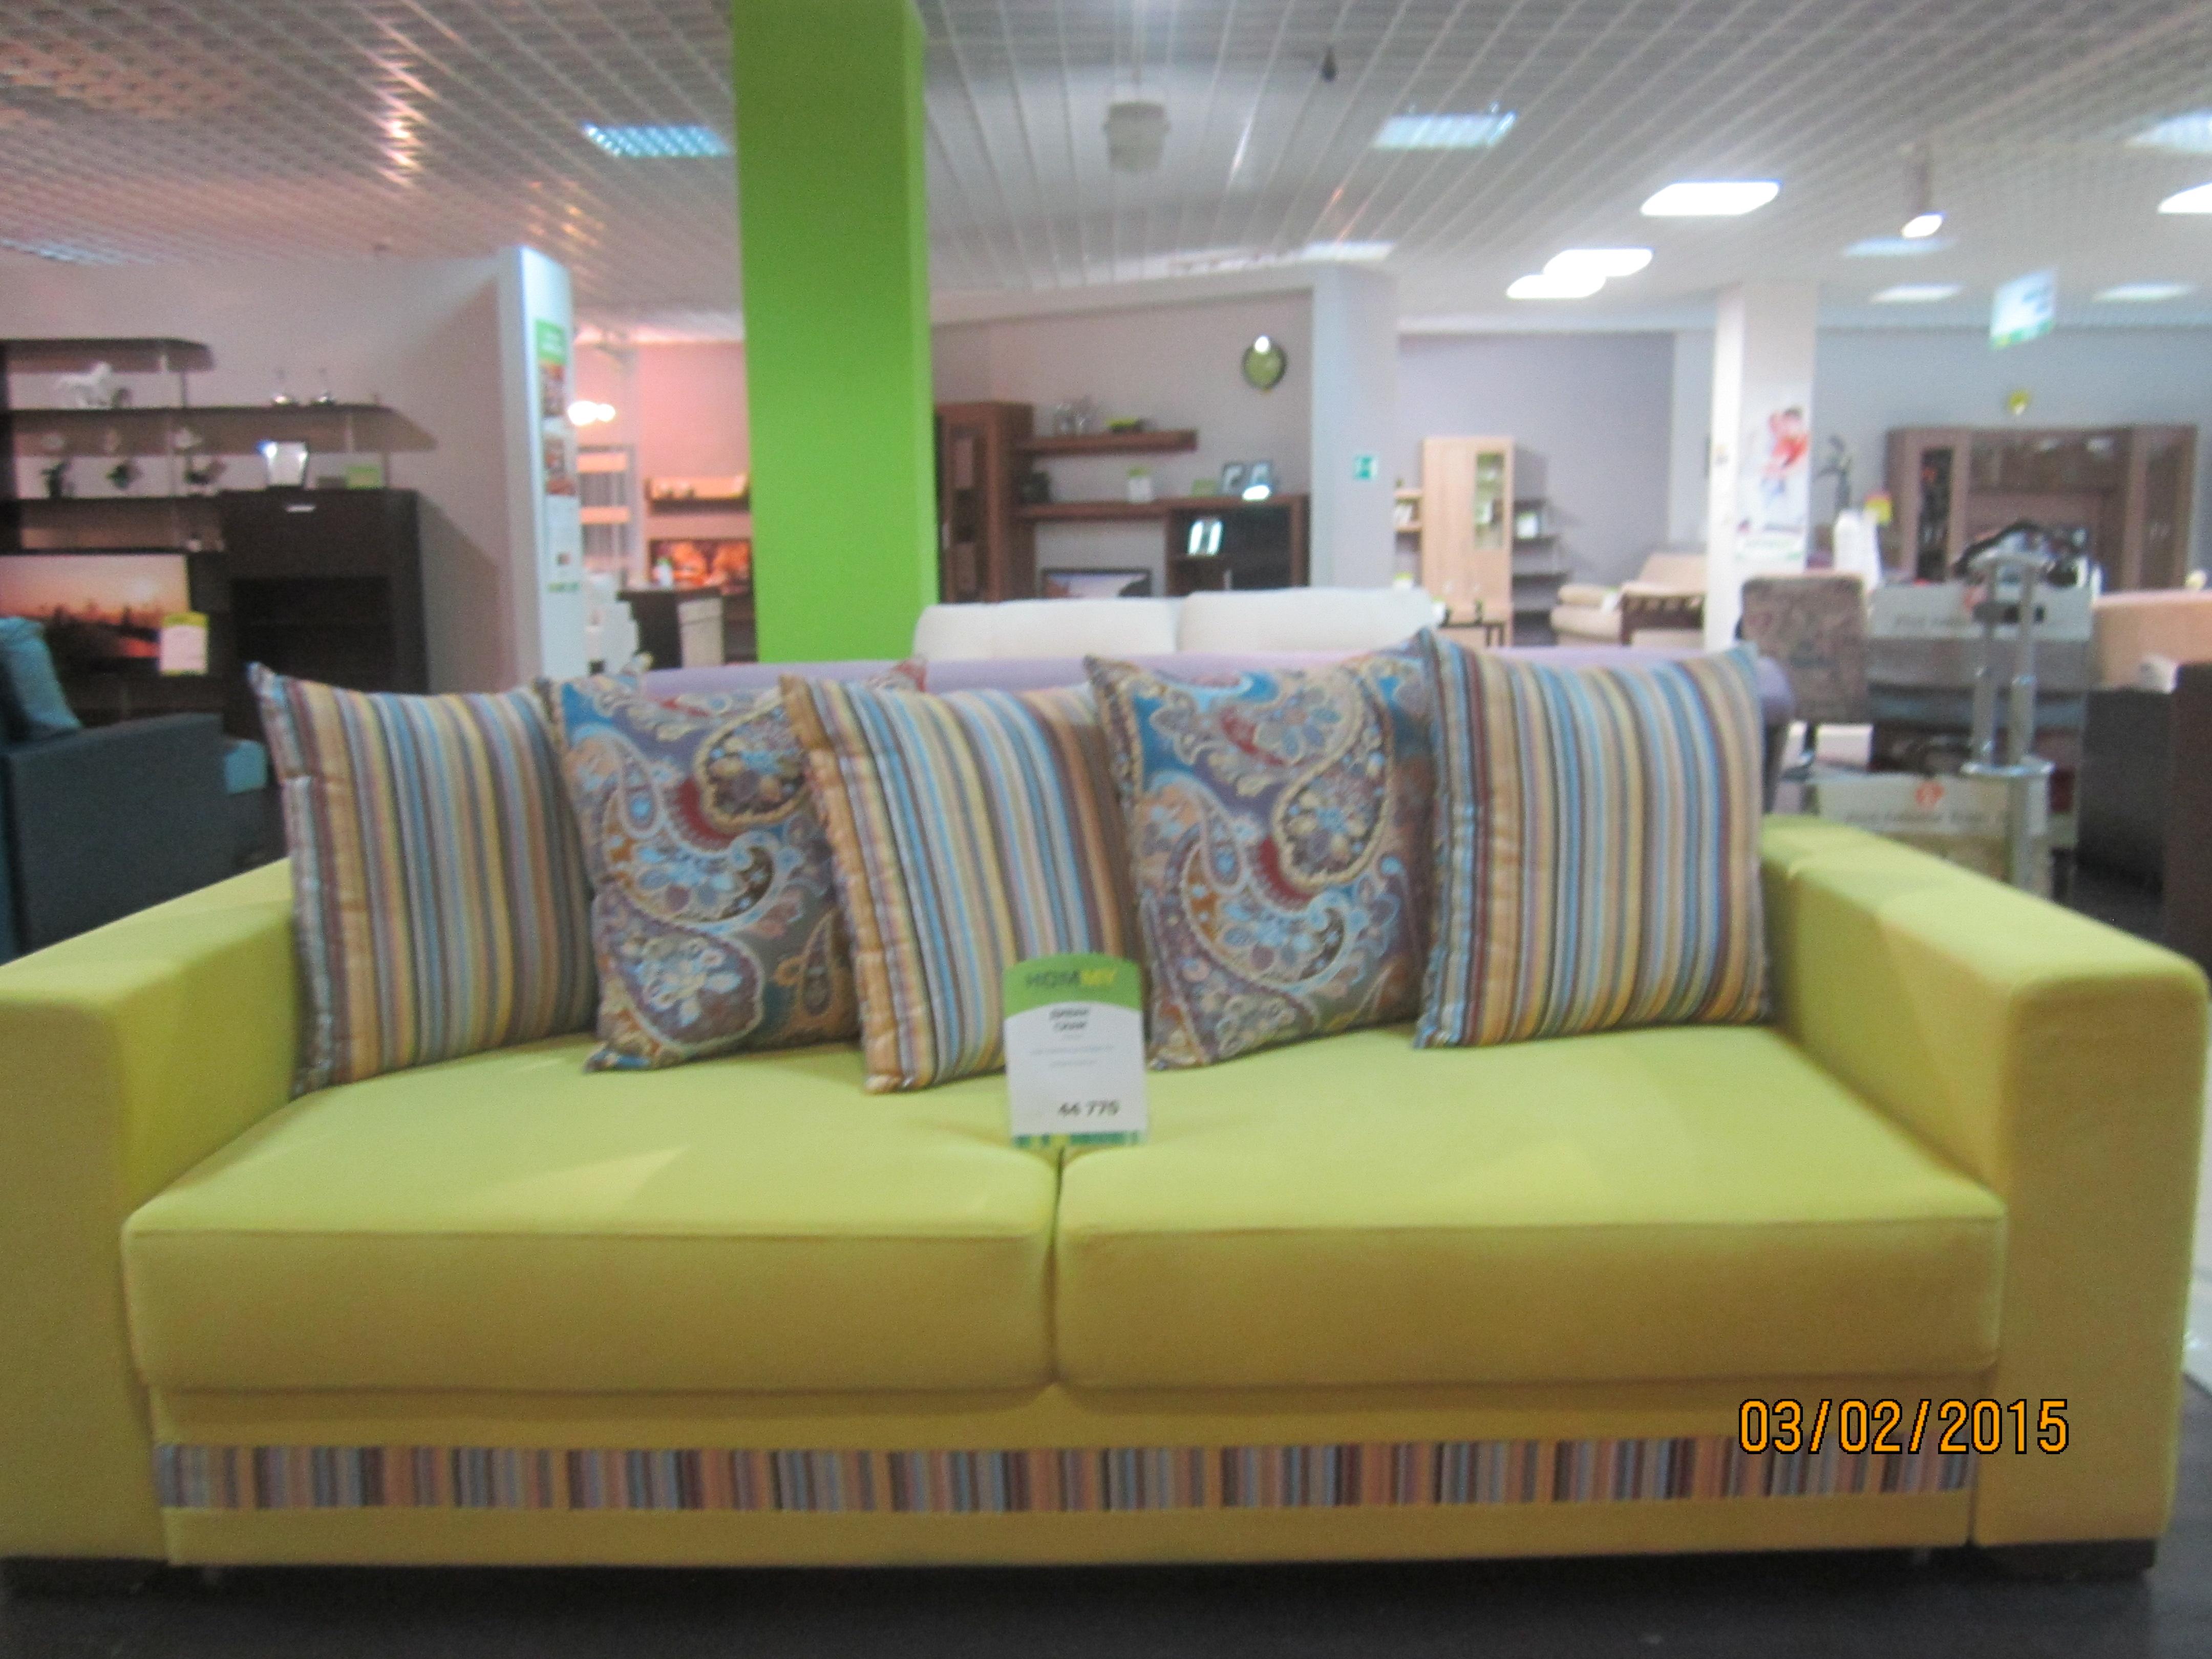 Диван-кровать Каскад 5 подушек  АнгстремМягкая мебель<br><br><br>Артикул: None<br>Высота: 630<br>Ширина: 2330<br>Глубина: 1080